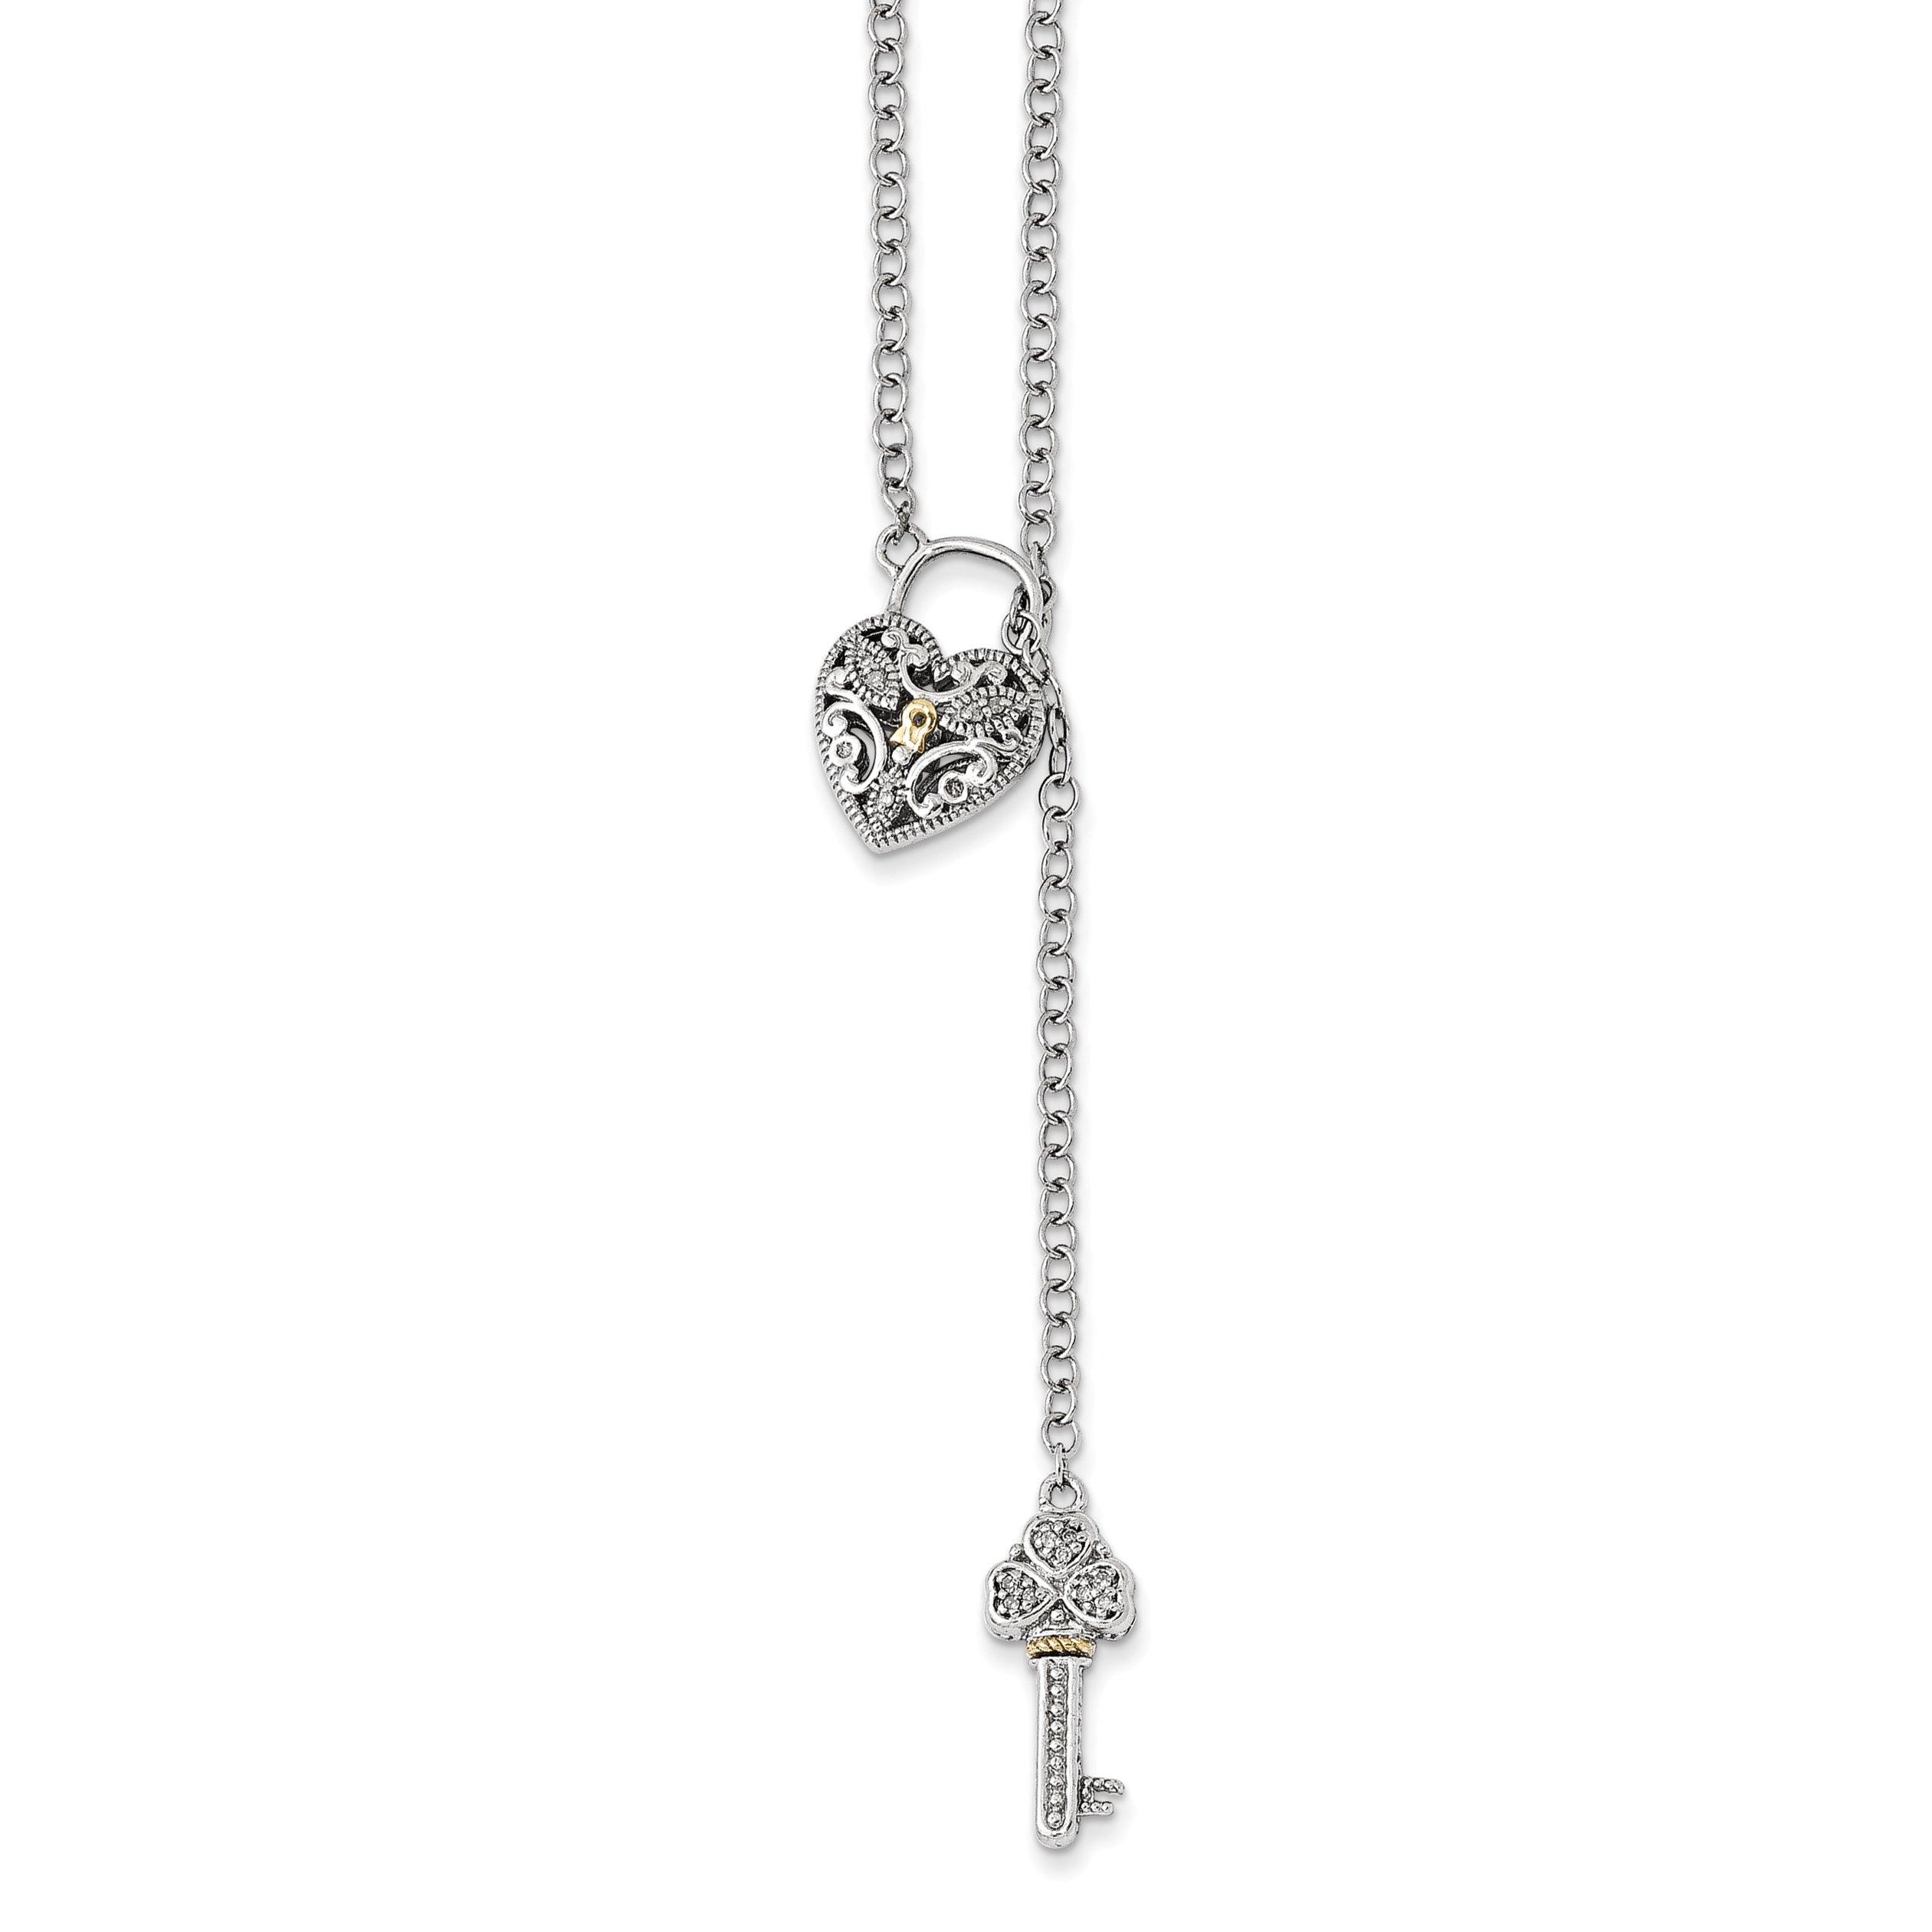 ICE CARATS 925 Sterling Silver 14k Diamond Heart Lock Key Chain Necklace S/love Fine Jewelry Gift Set For Women Heart